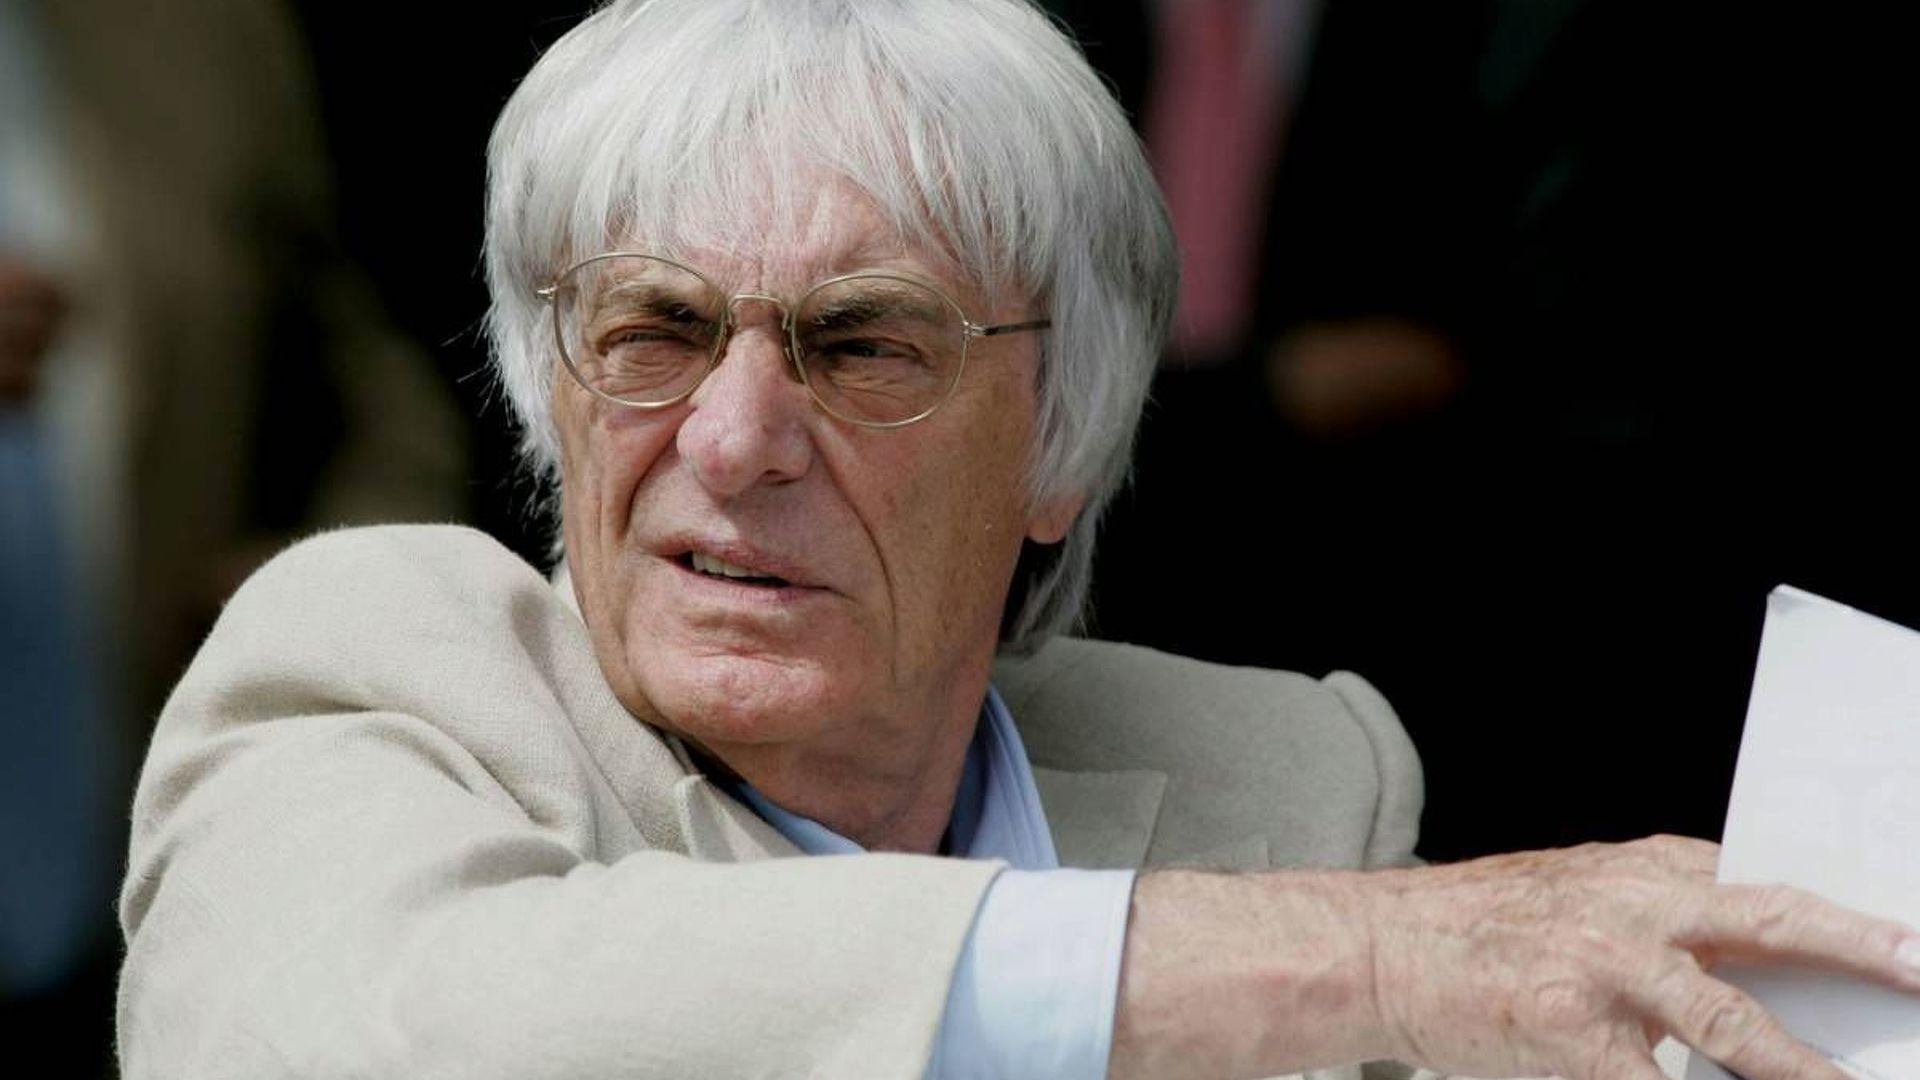 Spa must pay to keep hosting popular GP - Ecclestone